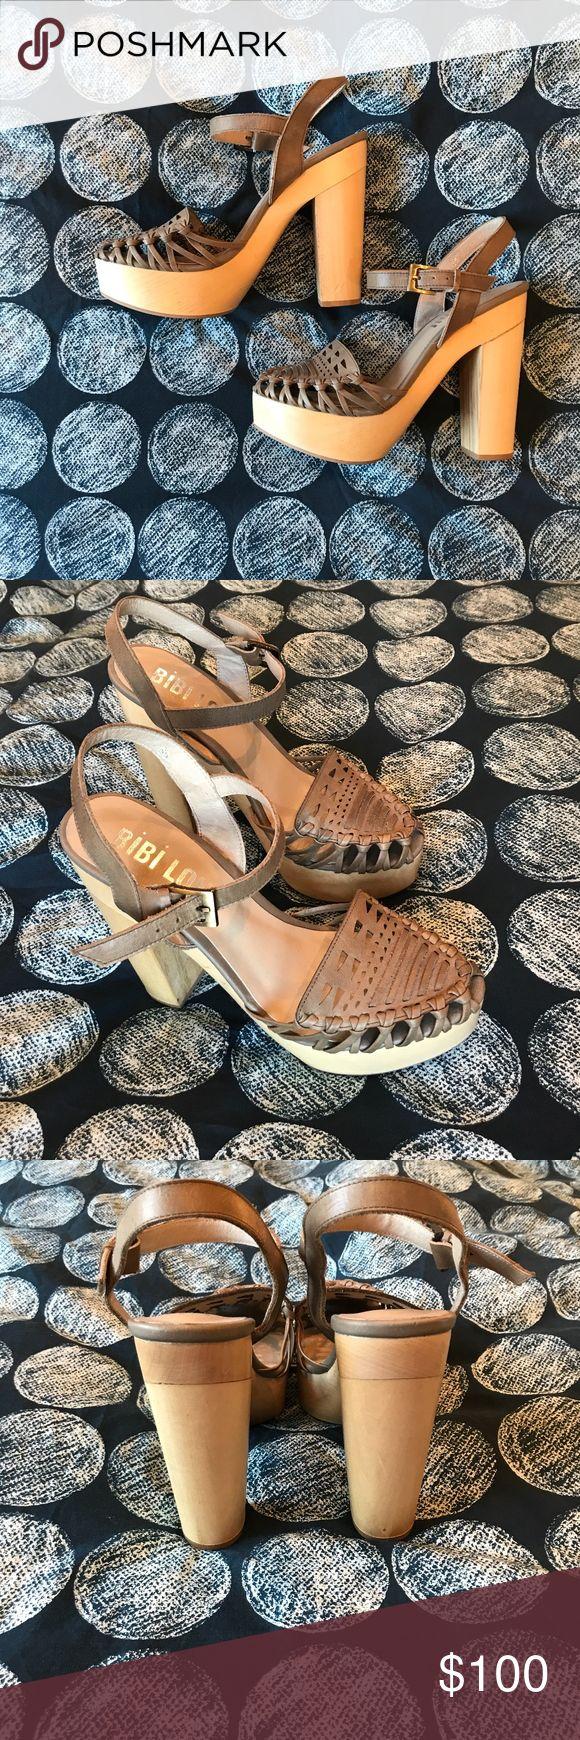 I just added this listing on Poshmark: BiBi Lou Woven Leather Platform Sandals. #shopmycloset #poshmark #fashion #shopping #style #forsale #Bibi Lou #Shoes